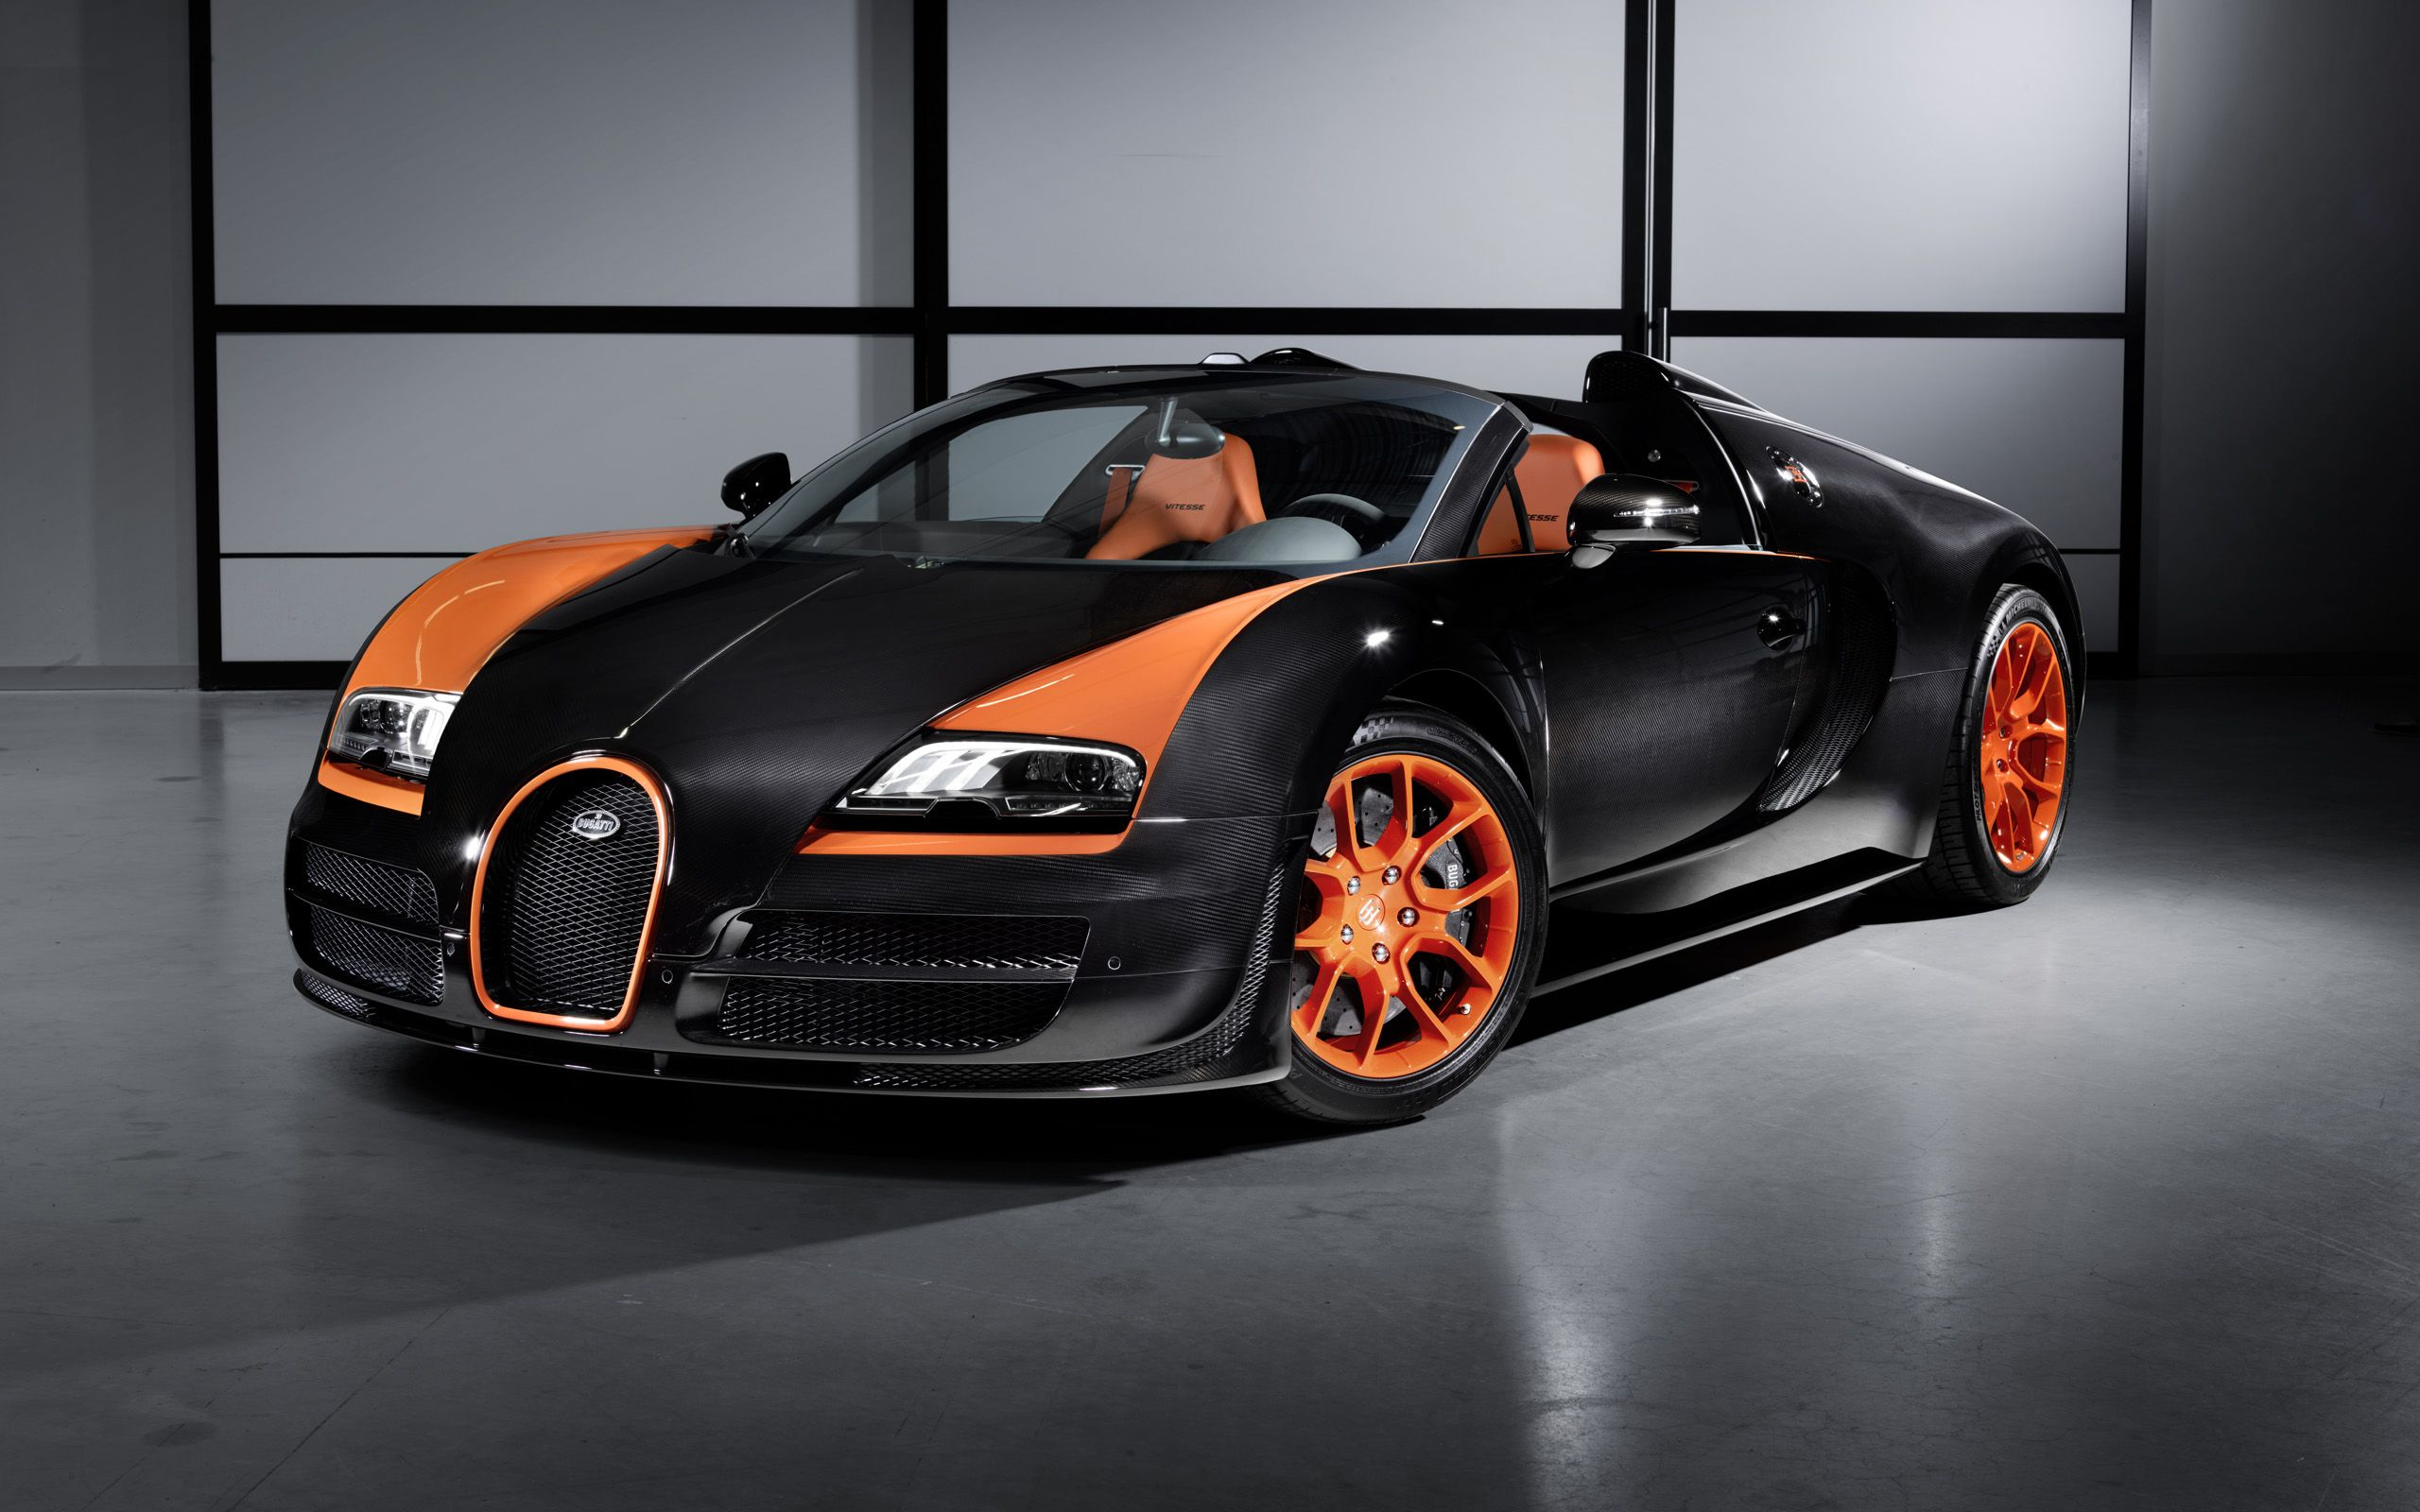 de6cc8063a985e4799780e8506a967ee Fascinating Bugatti Veyron Grand Sport Vitesse 1/4 Mile Cars Trend